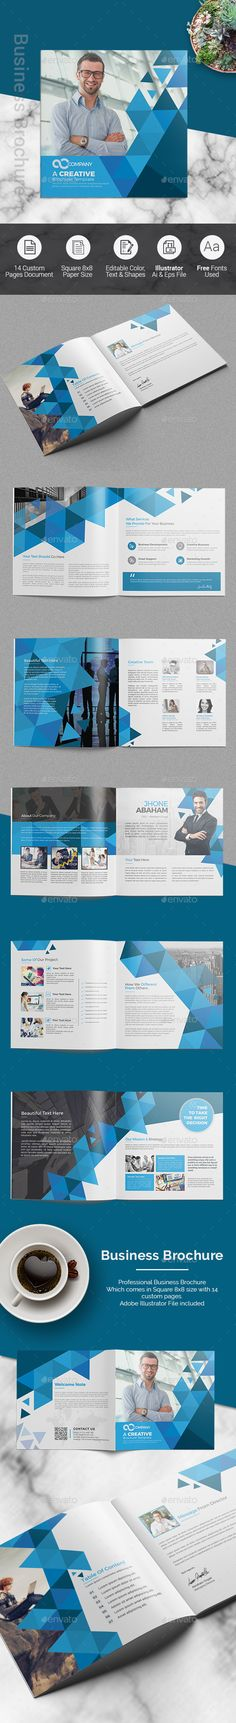 Square Business Brochure Template Vector EPS, AI Illustrator